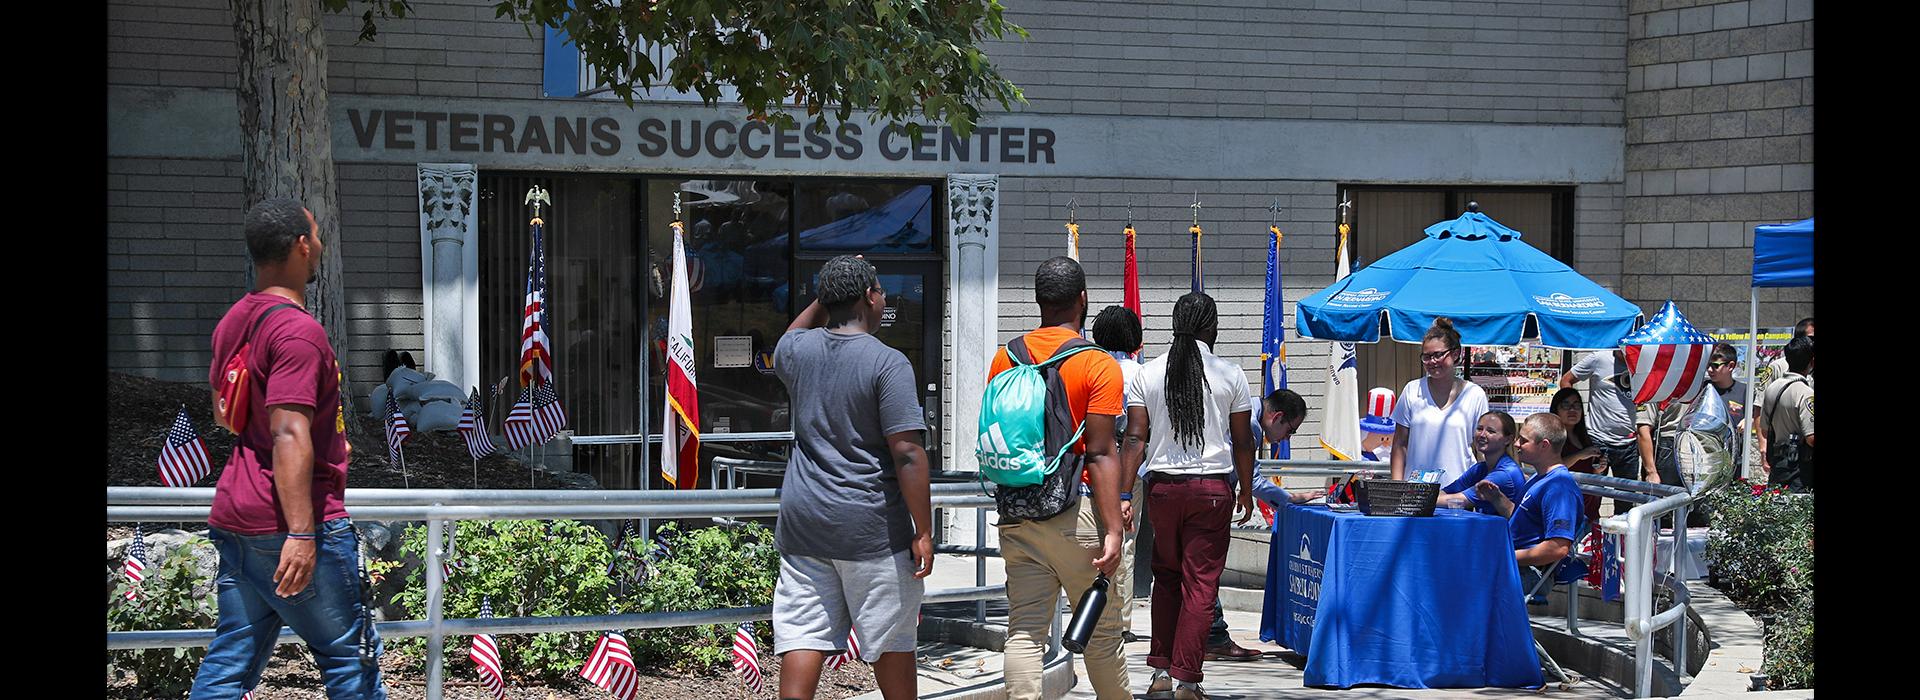 Veterans Success Center Open House set for June 25